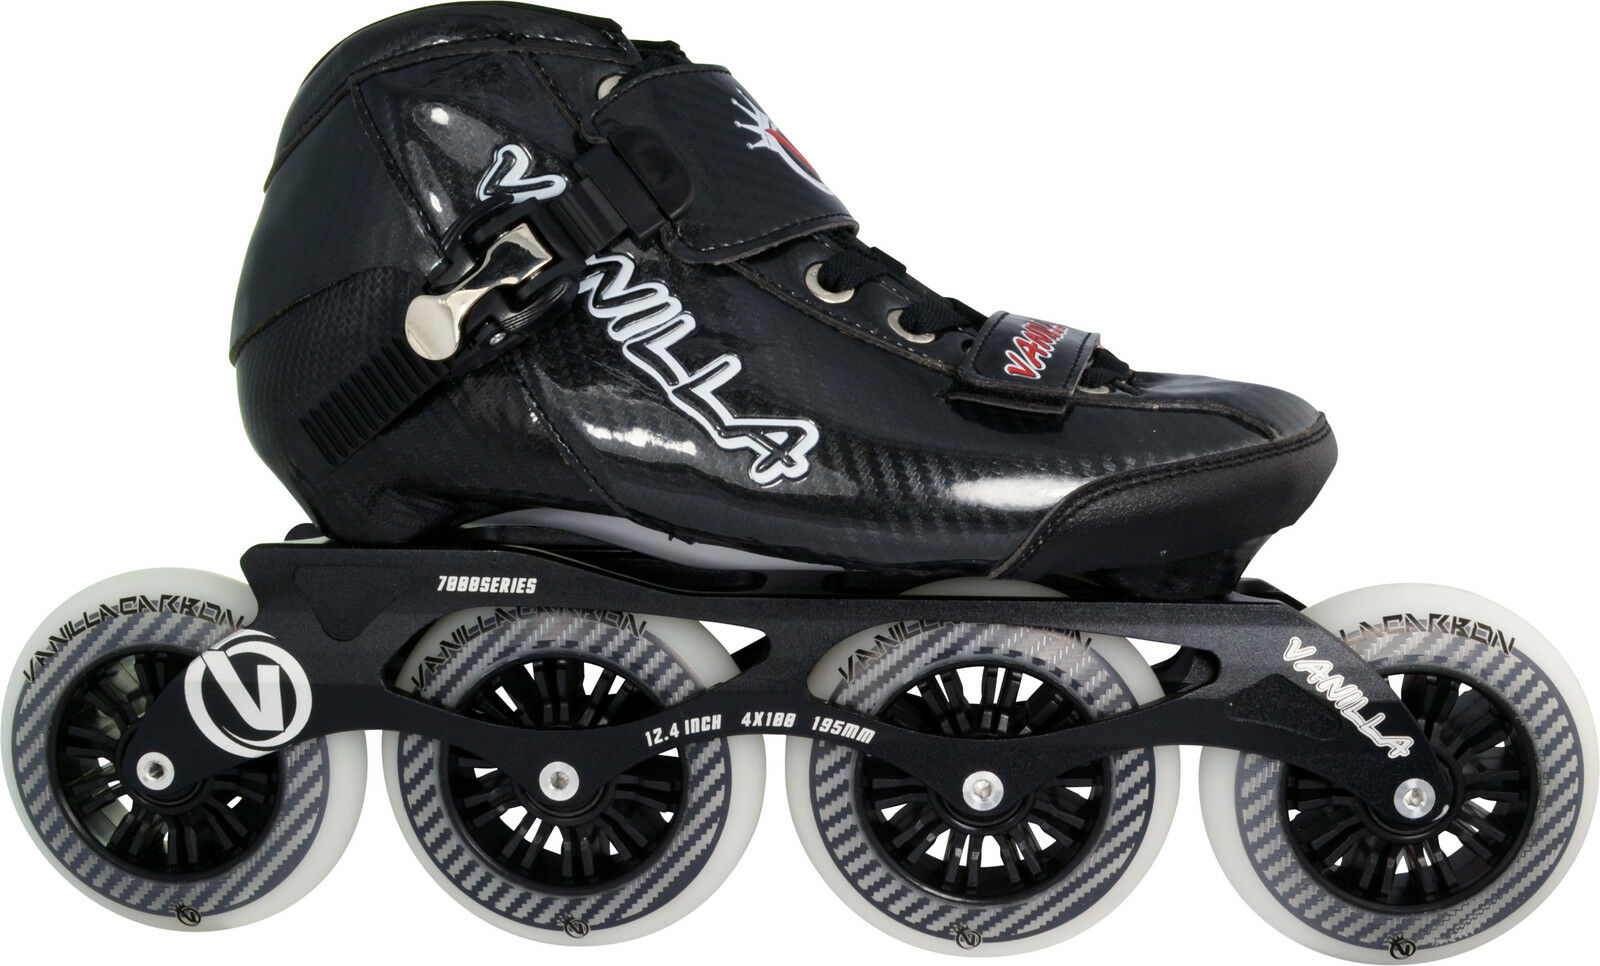 Carbon Inline Skates - Speed Fitness Racing Skate by Vanilla - Men & Damens